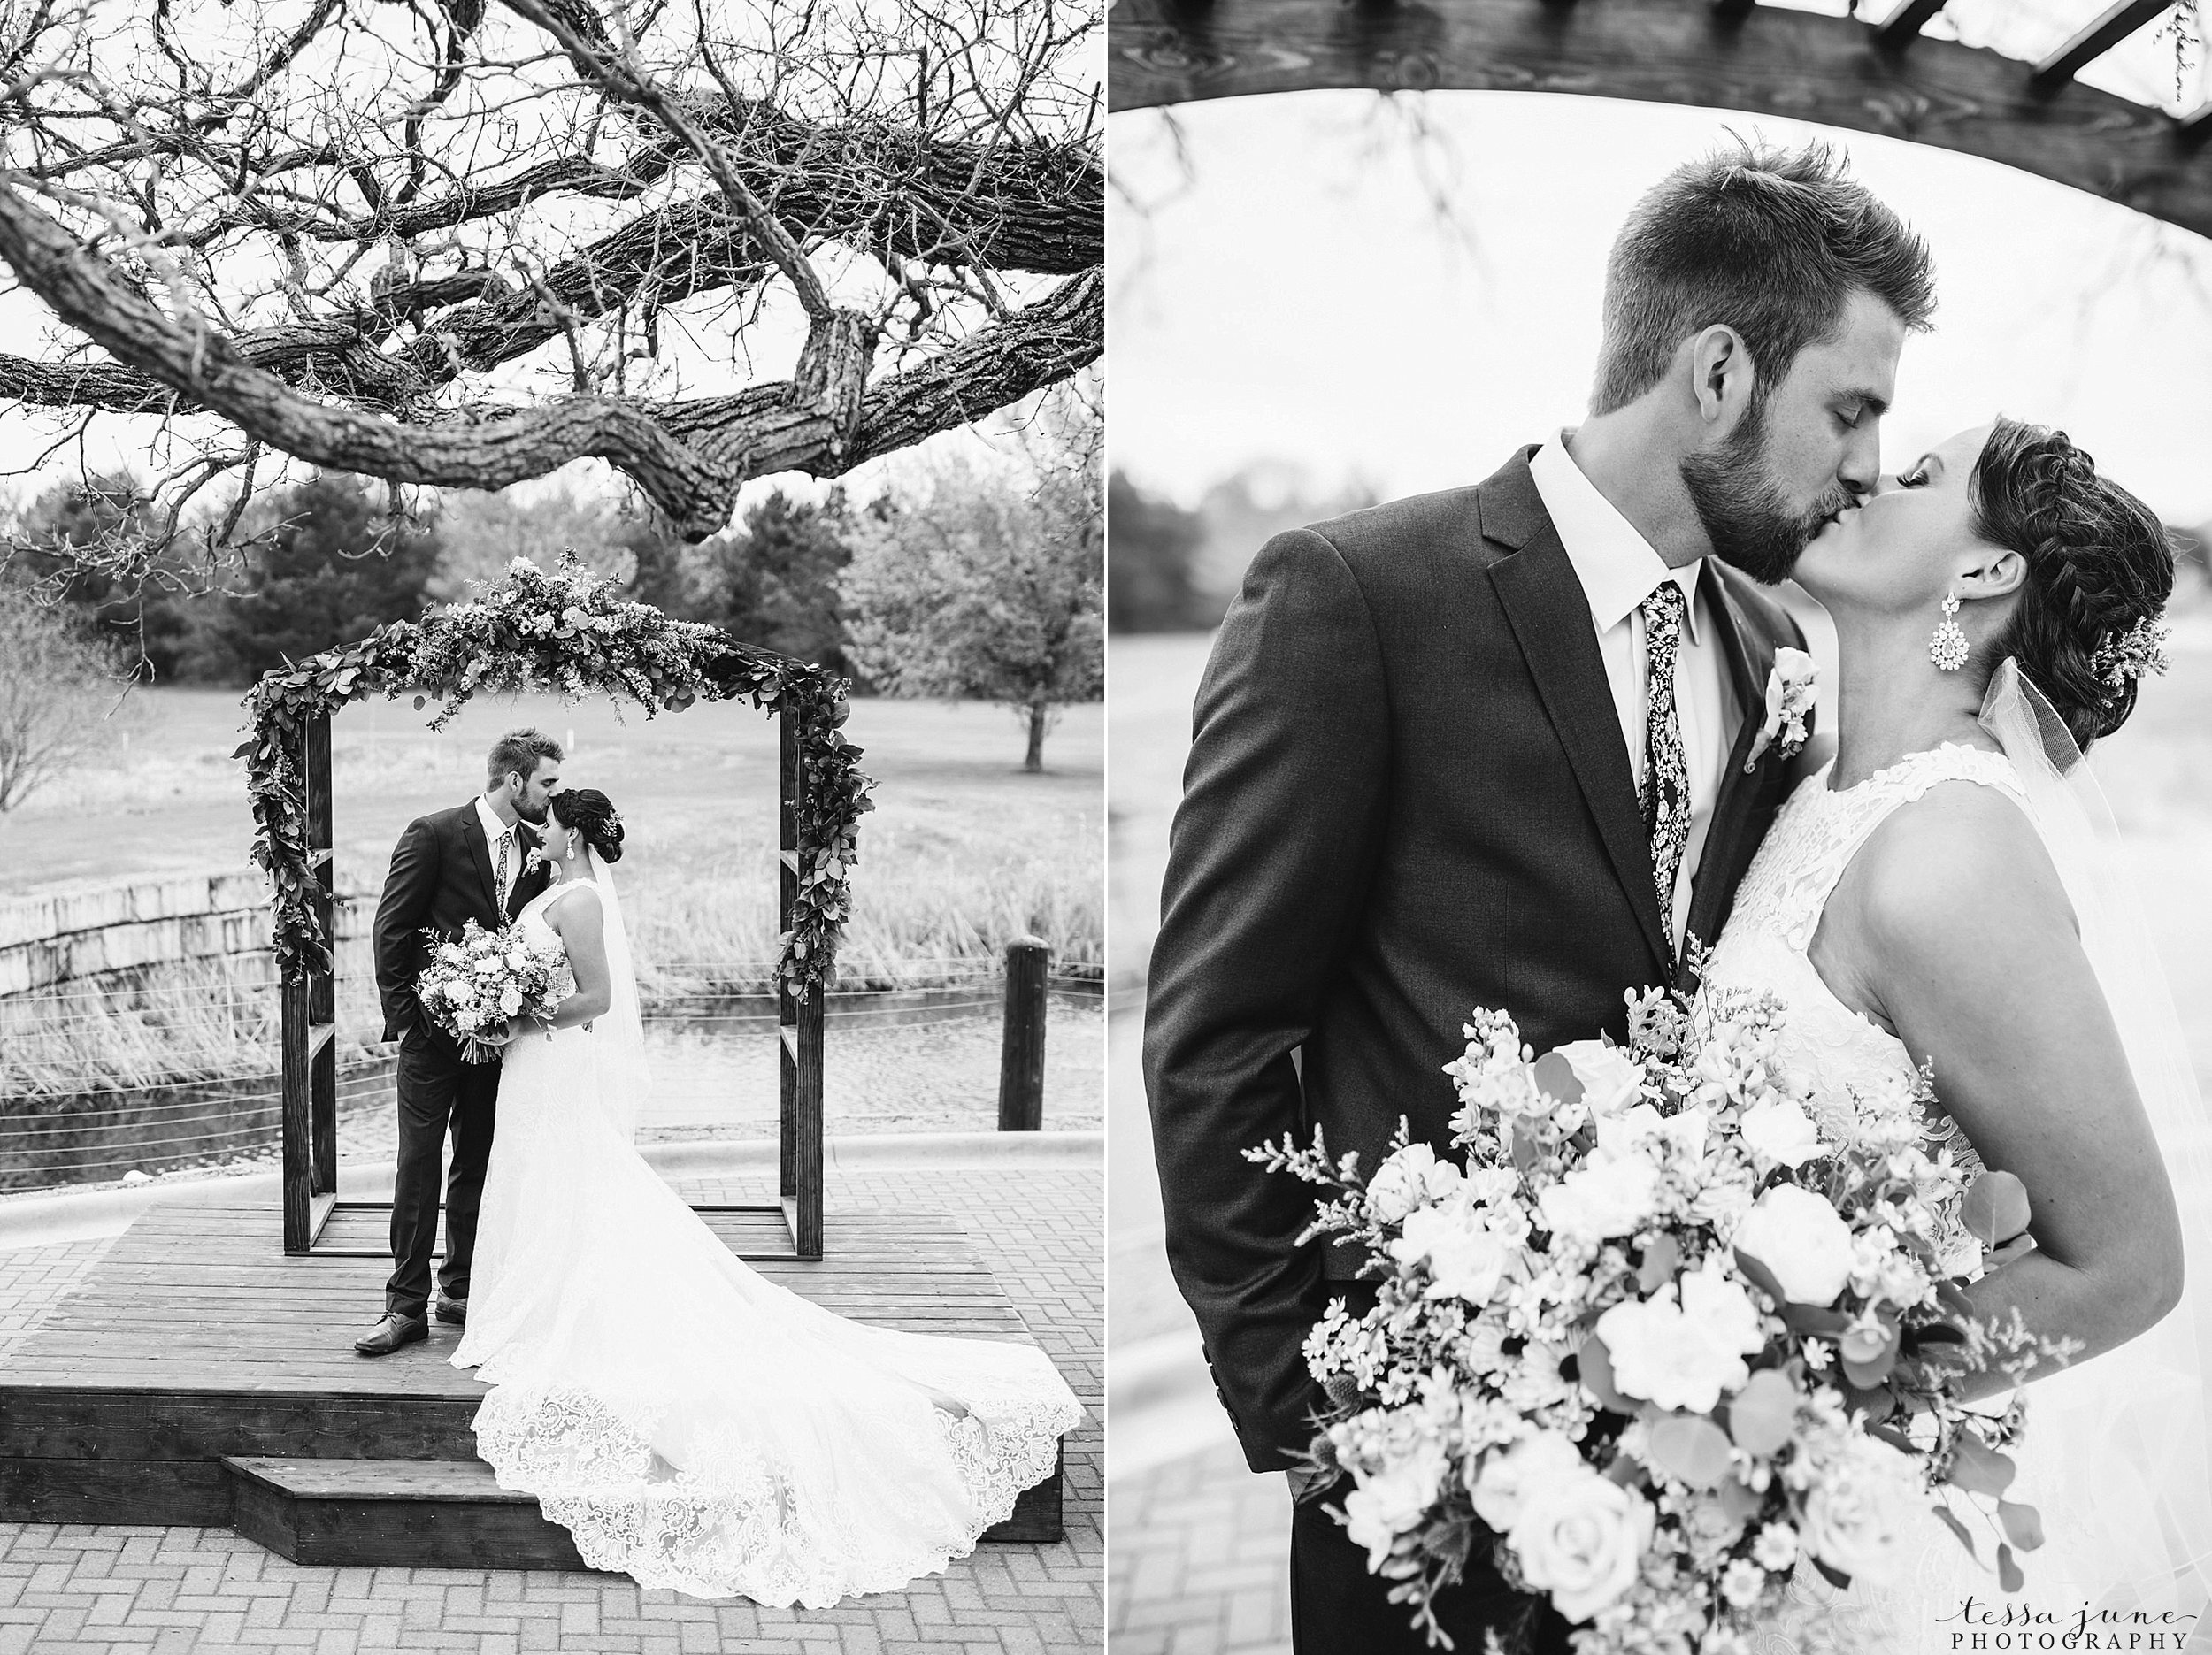 The-grands-at-mulligans-wedding-sartell-minnesota-spring-floral-spring-garden-wedding-45.jpg